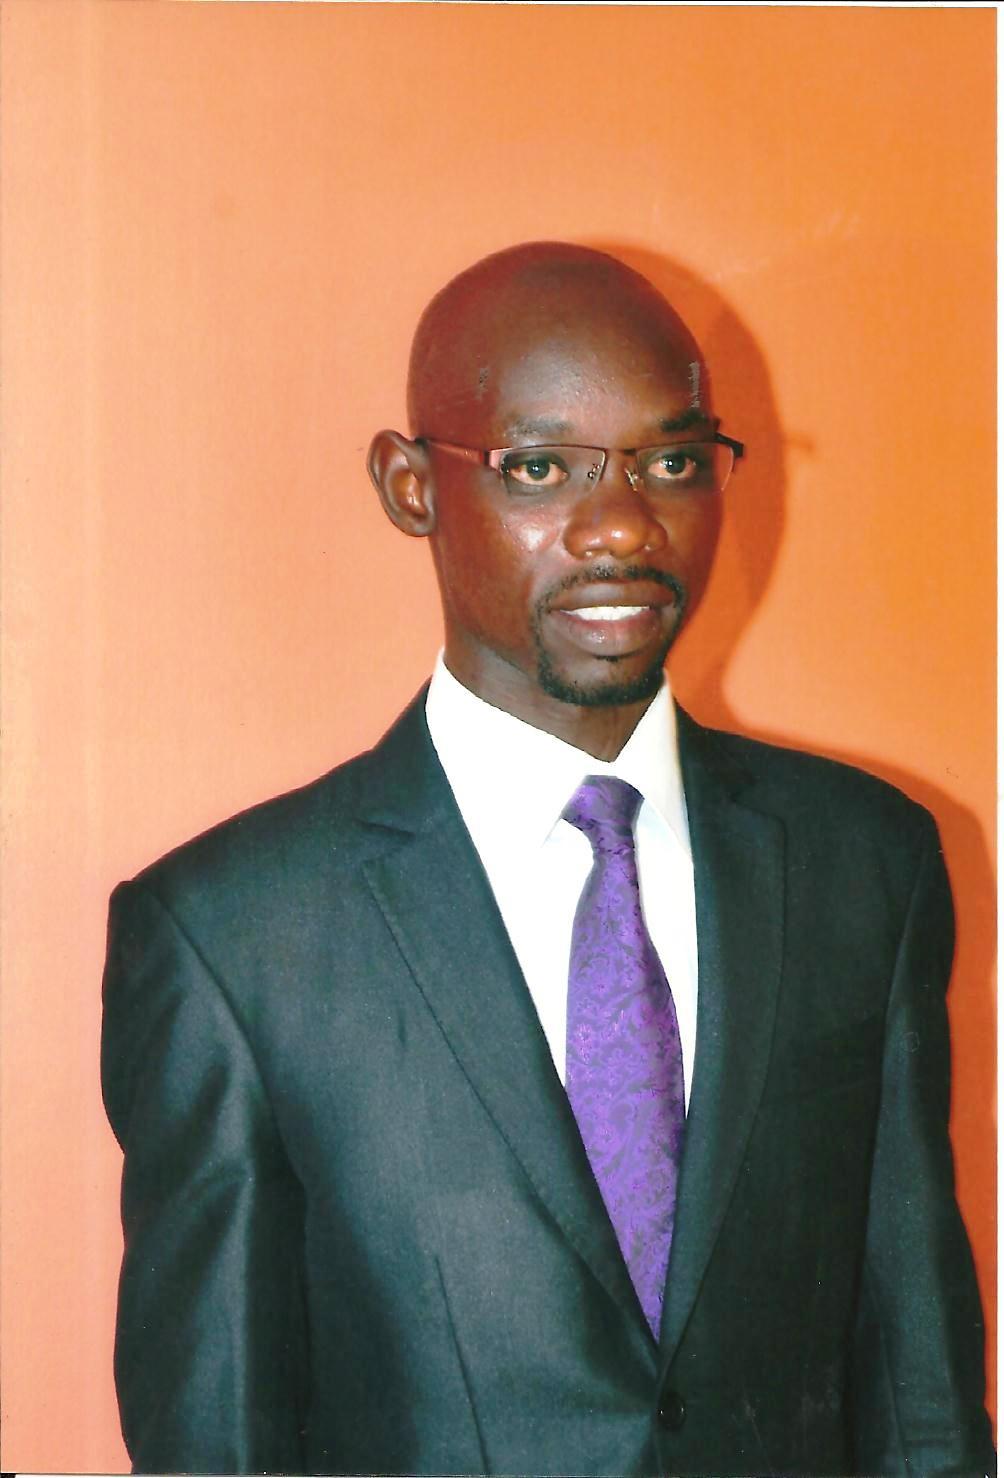 Attaques du JDS contre Mame Baye Niang: Babacar Diop: « un Dindon des bases besognes »